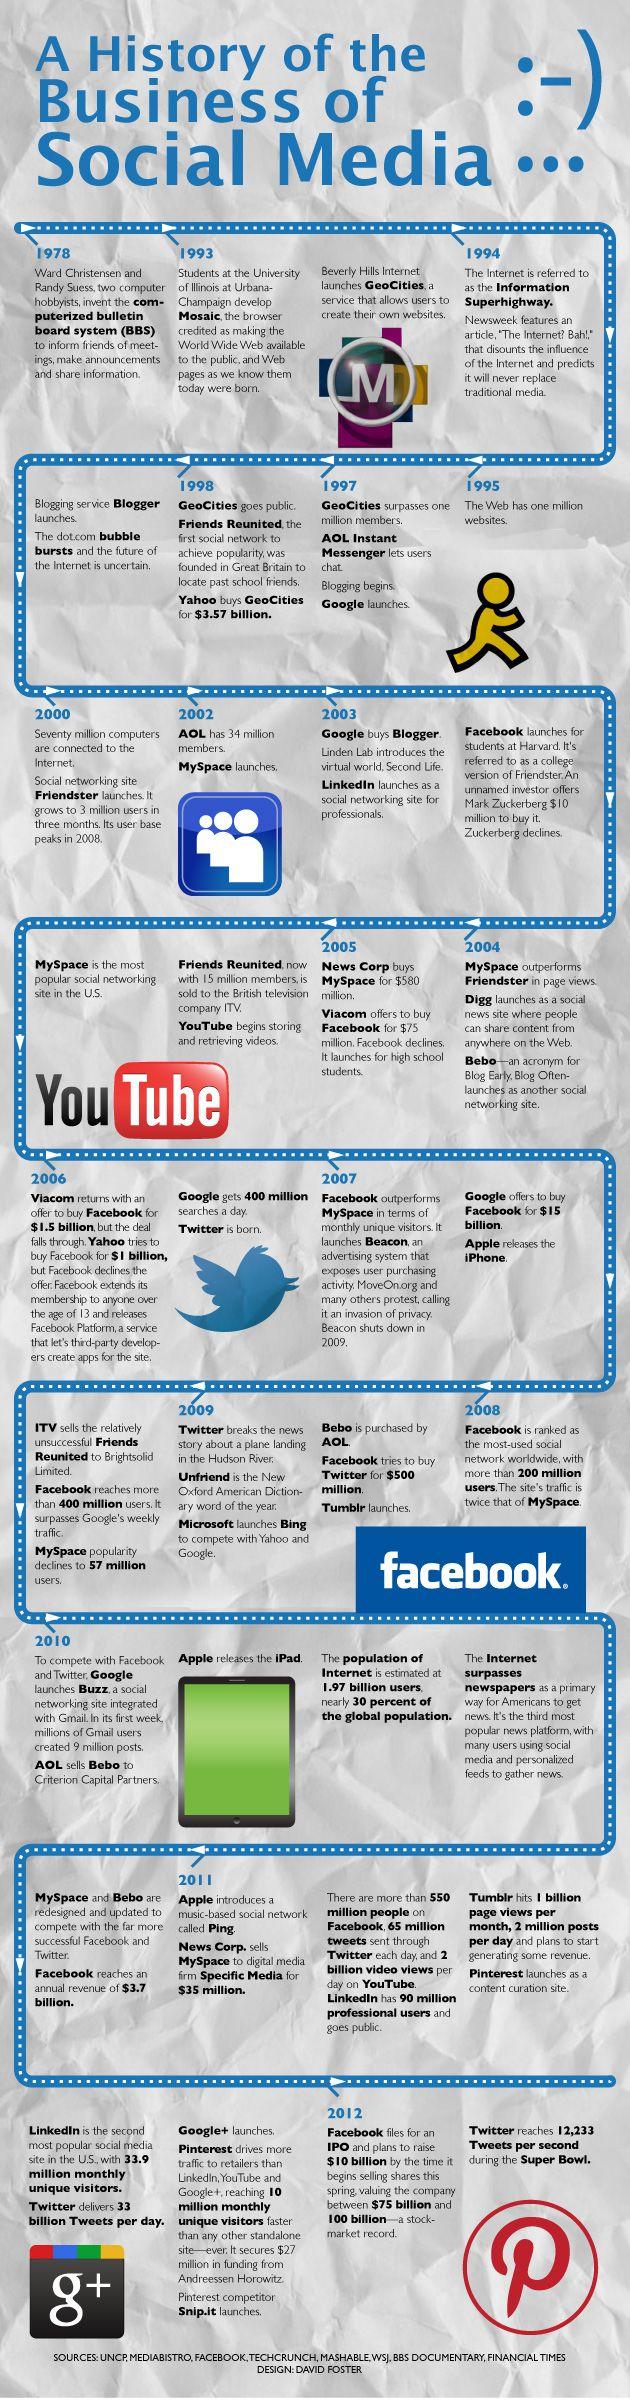 Social media history #marketing #socialmedia #toview #irecomend